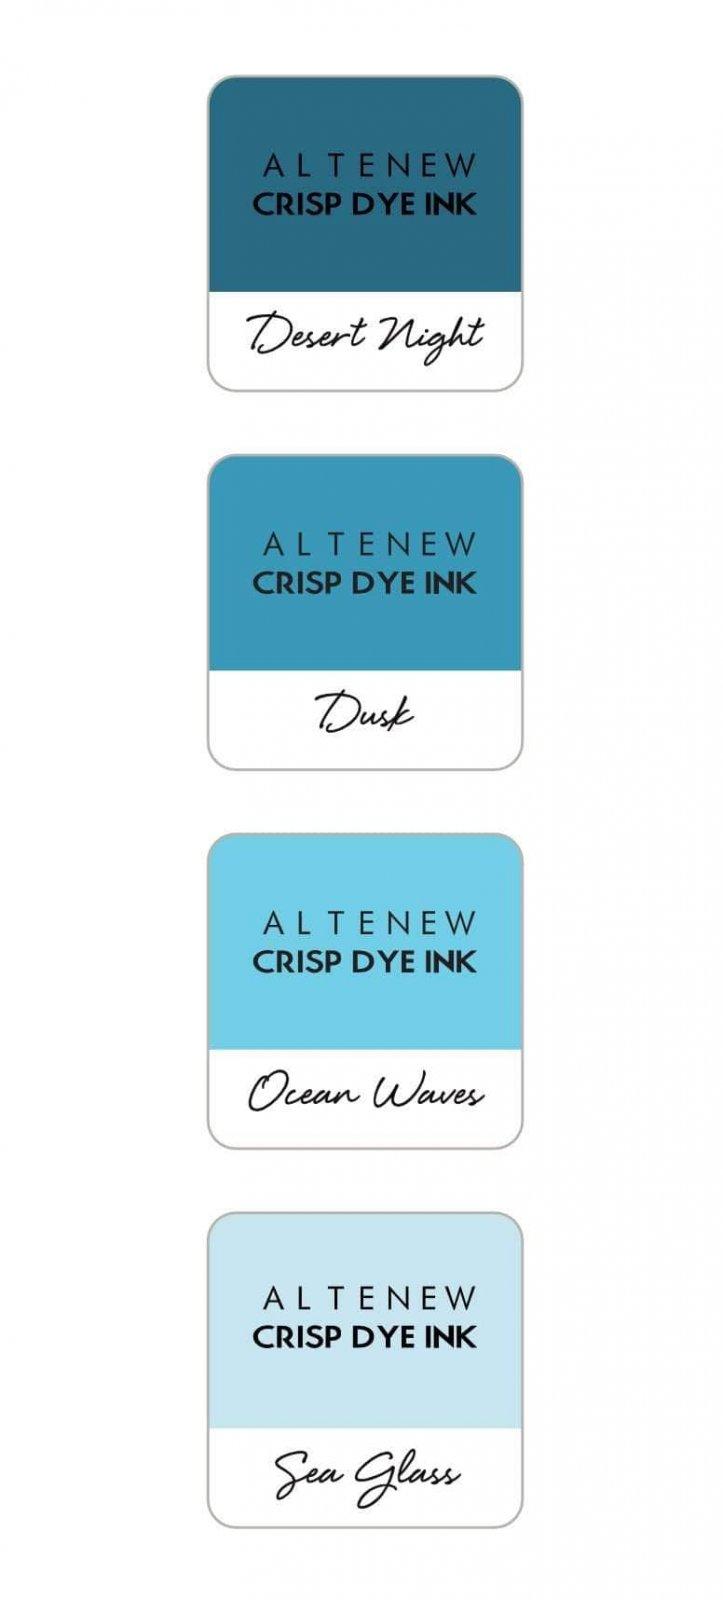 Altenew - Cool Summer Night Crisp Dye Ink Mini Cube Set